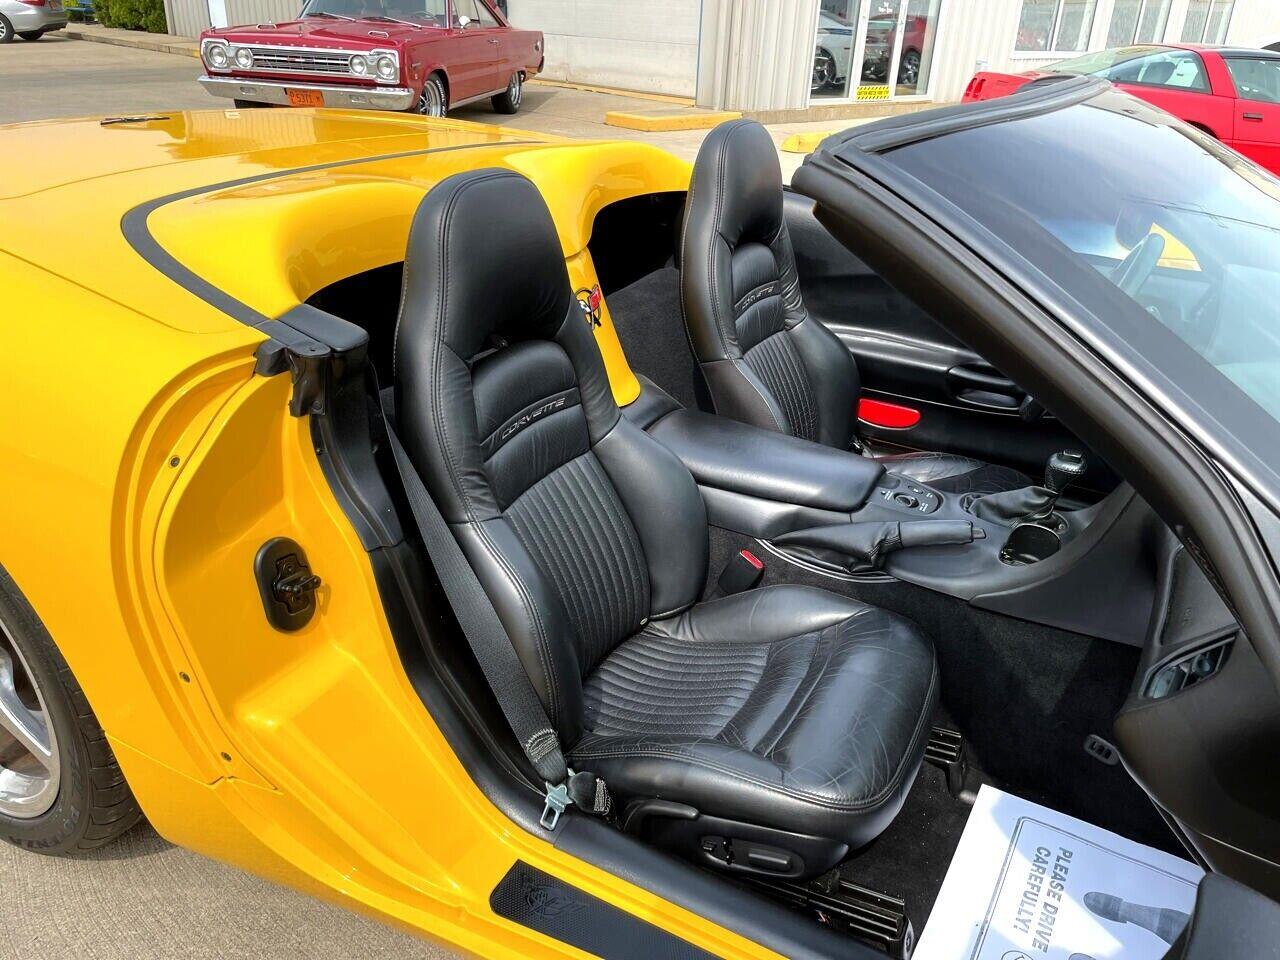 2004 Yellow Chevrolet Corvette Convertible    C5 Corvette Photo 6